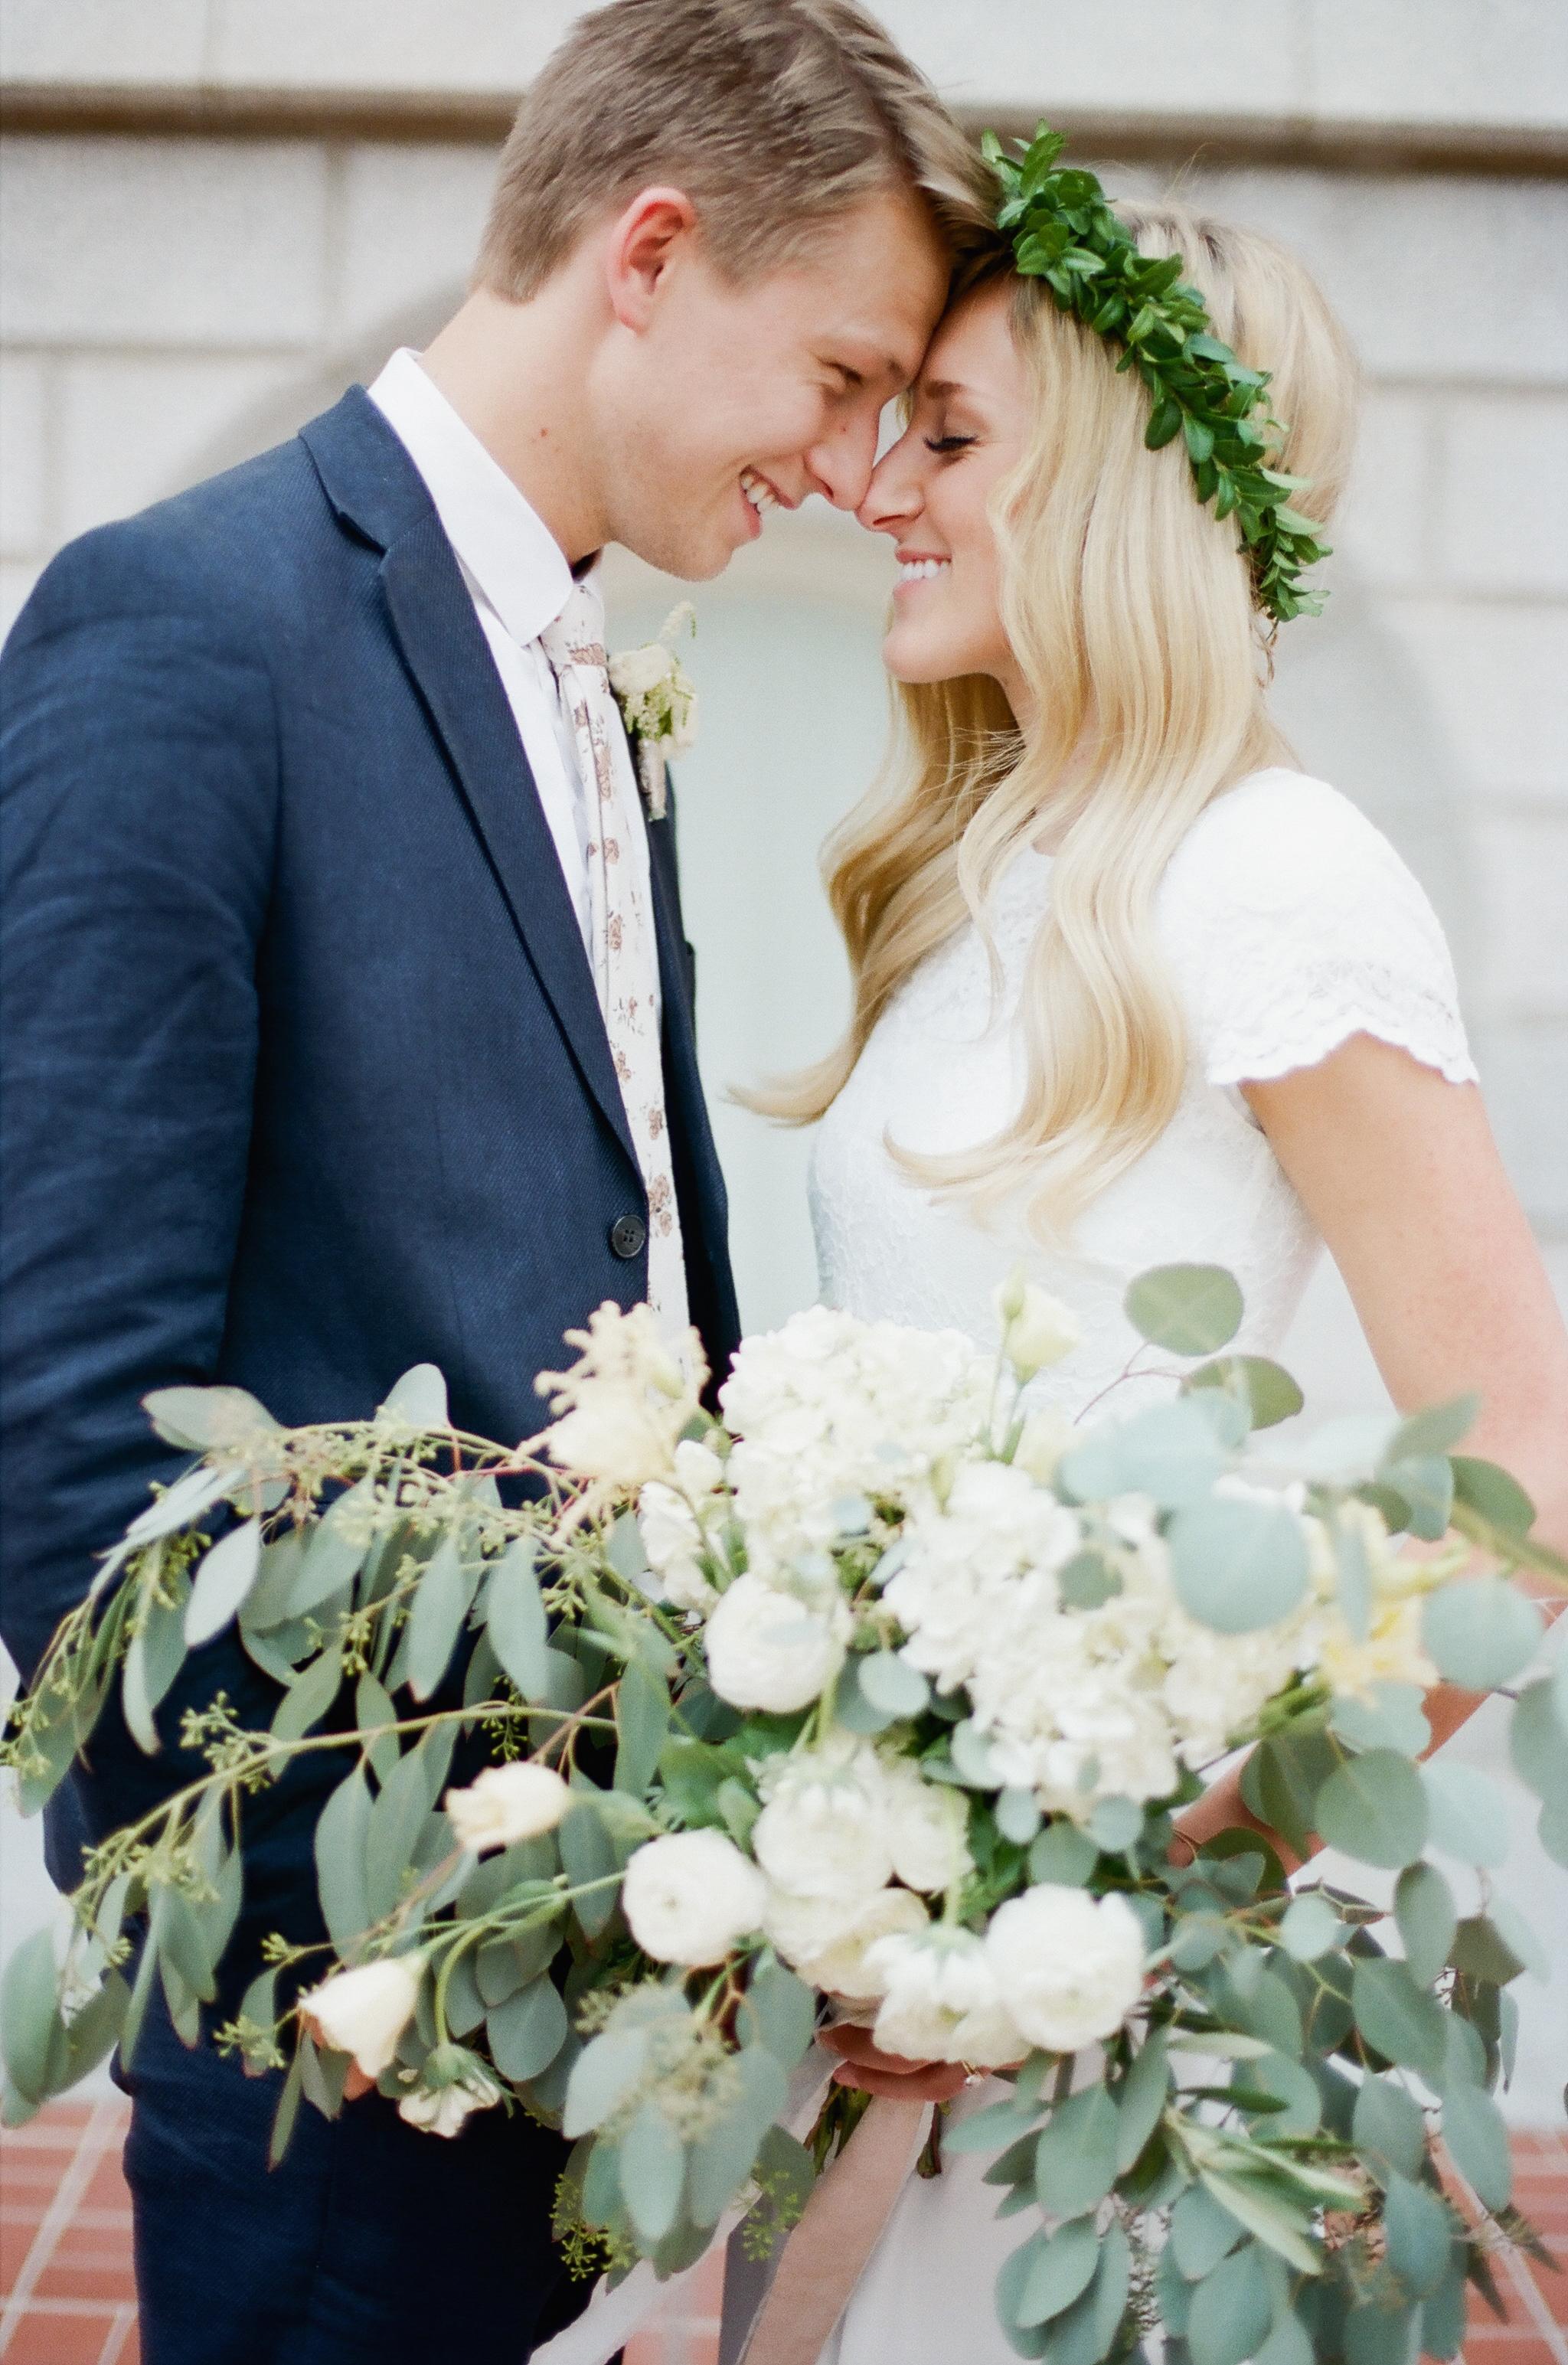 Wynona Benson Photography - Jaleisa & Logan Romantic Elegant Utah Wedding00040.jpg